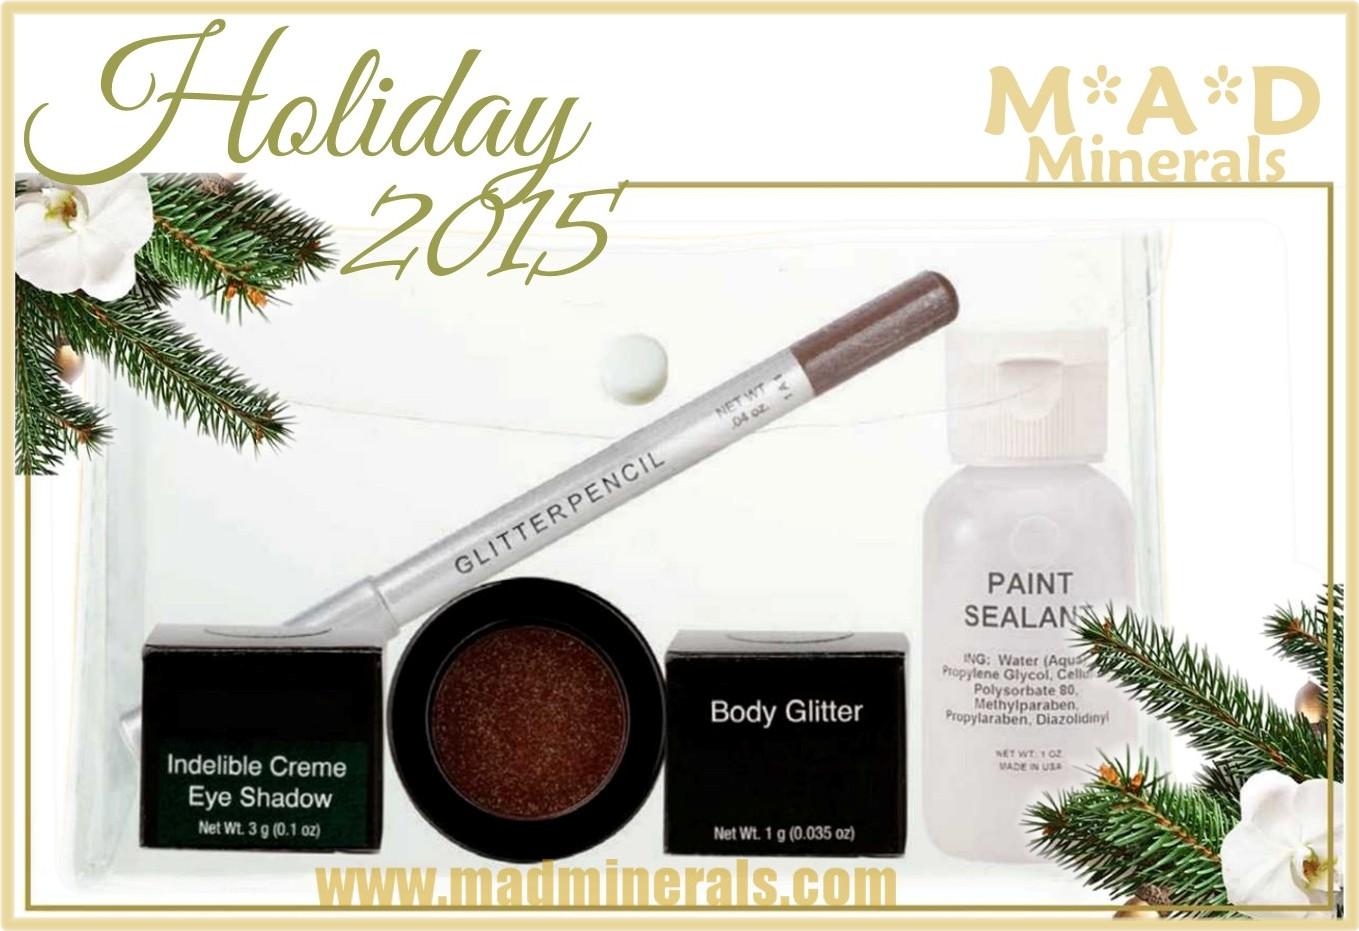 Pre-Order 5 Piece Holiday 2015 Glitz & Glam Kit